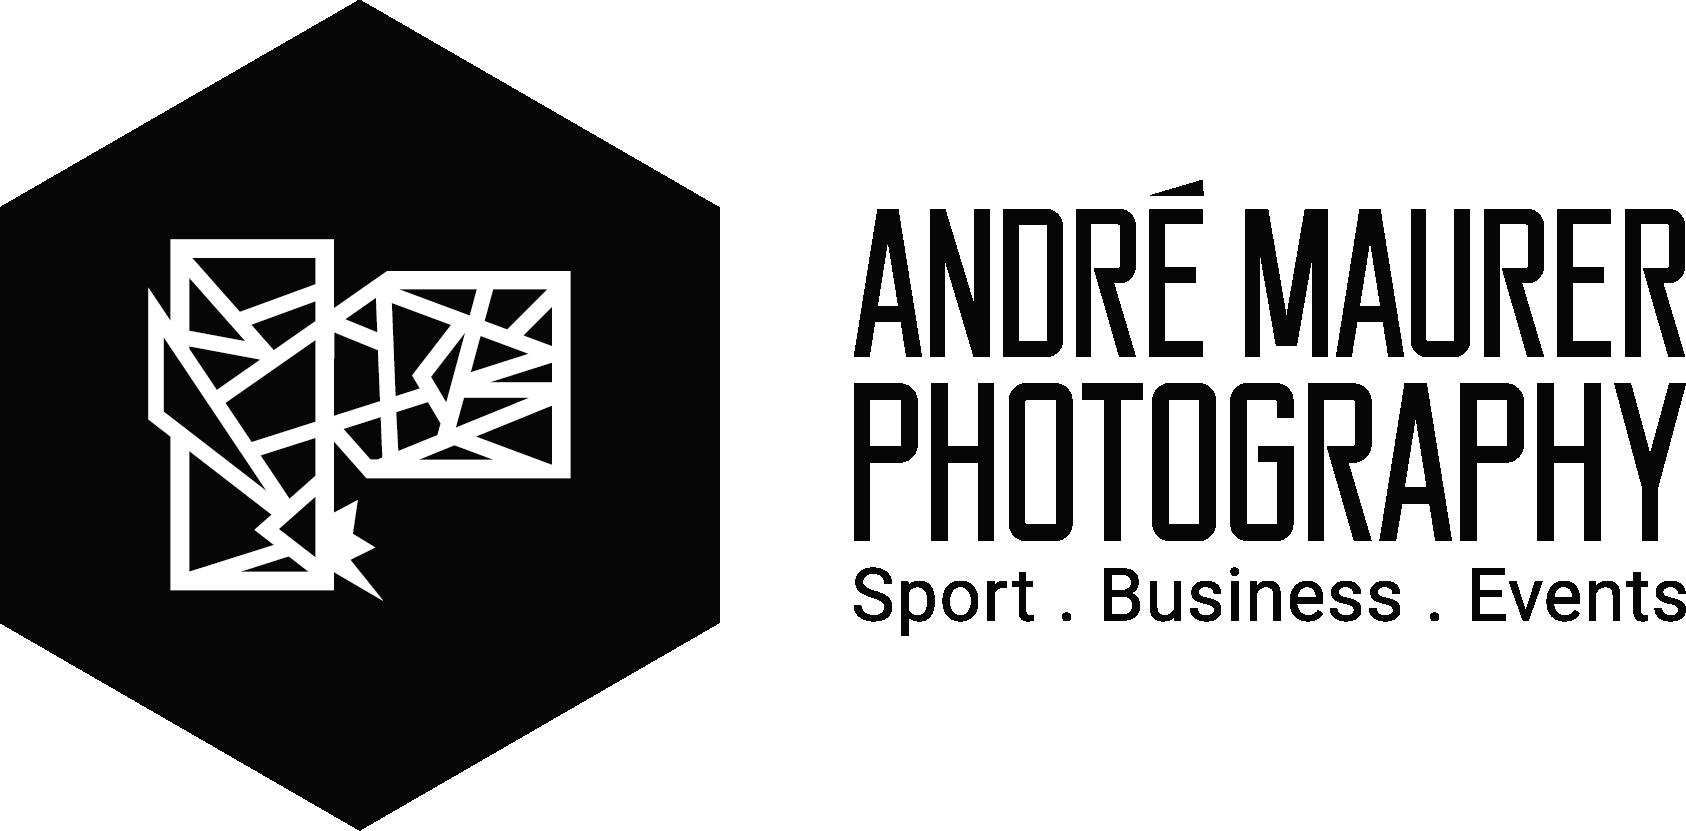 André Maurer Photography